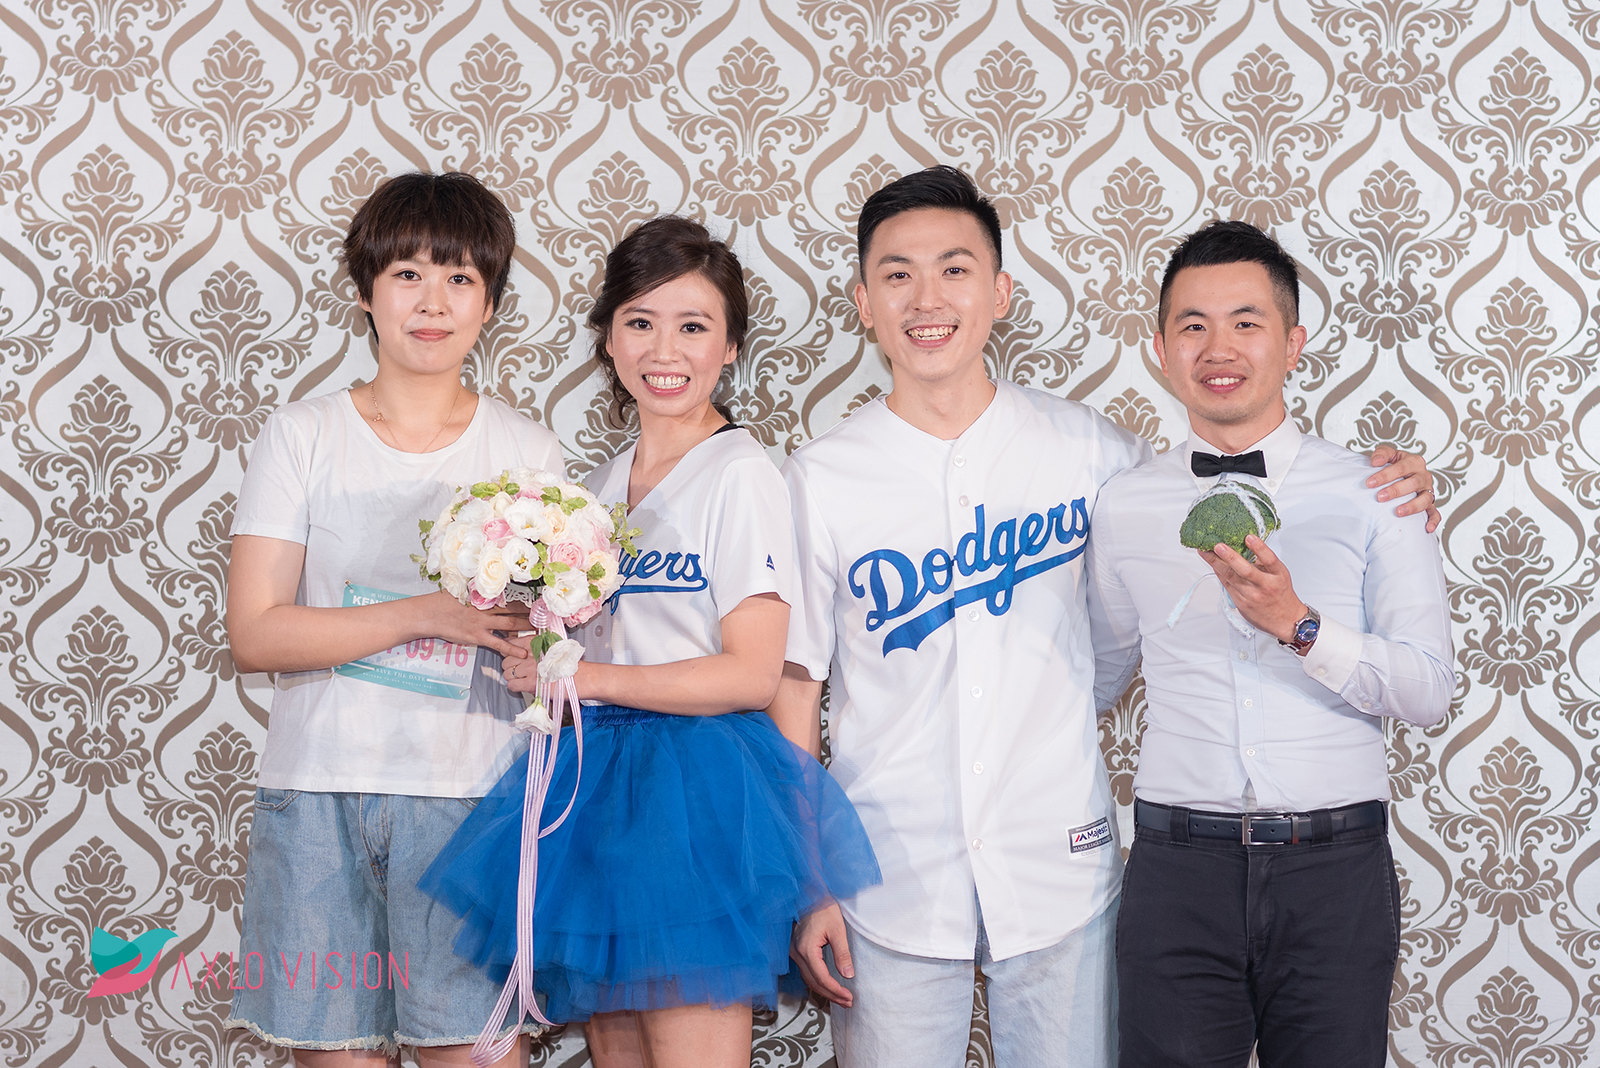 20170916 WeddingDay_174